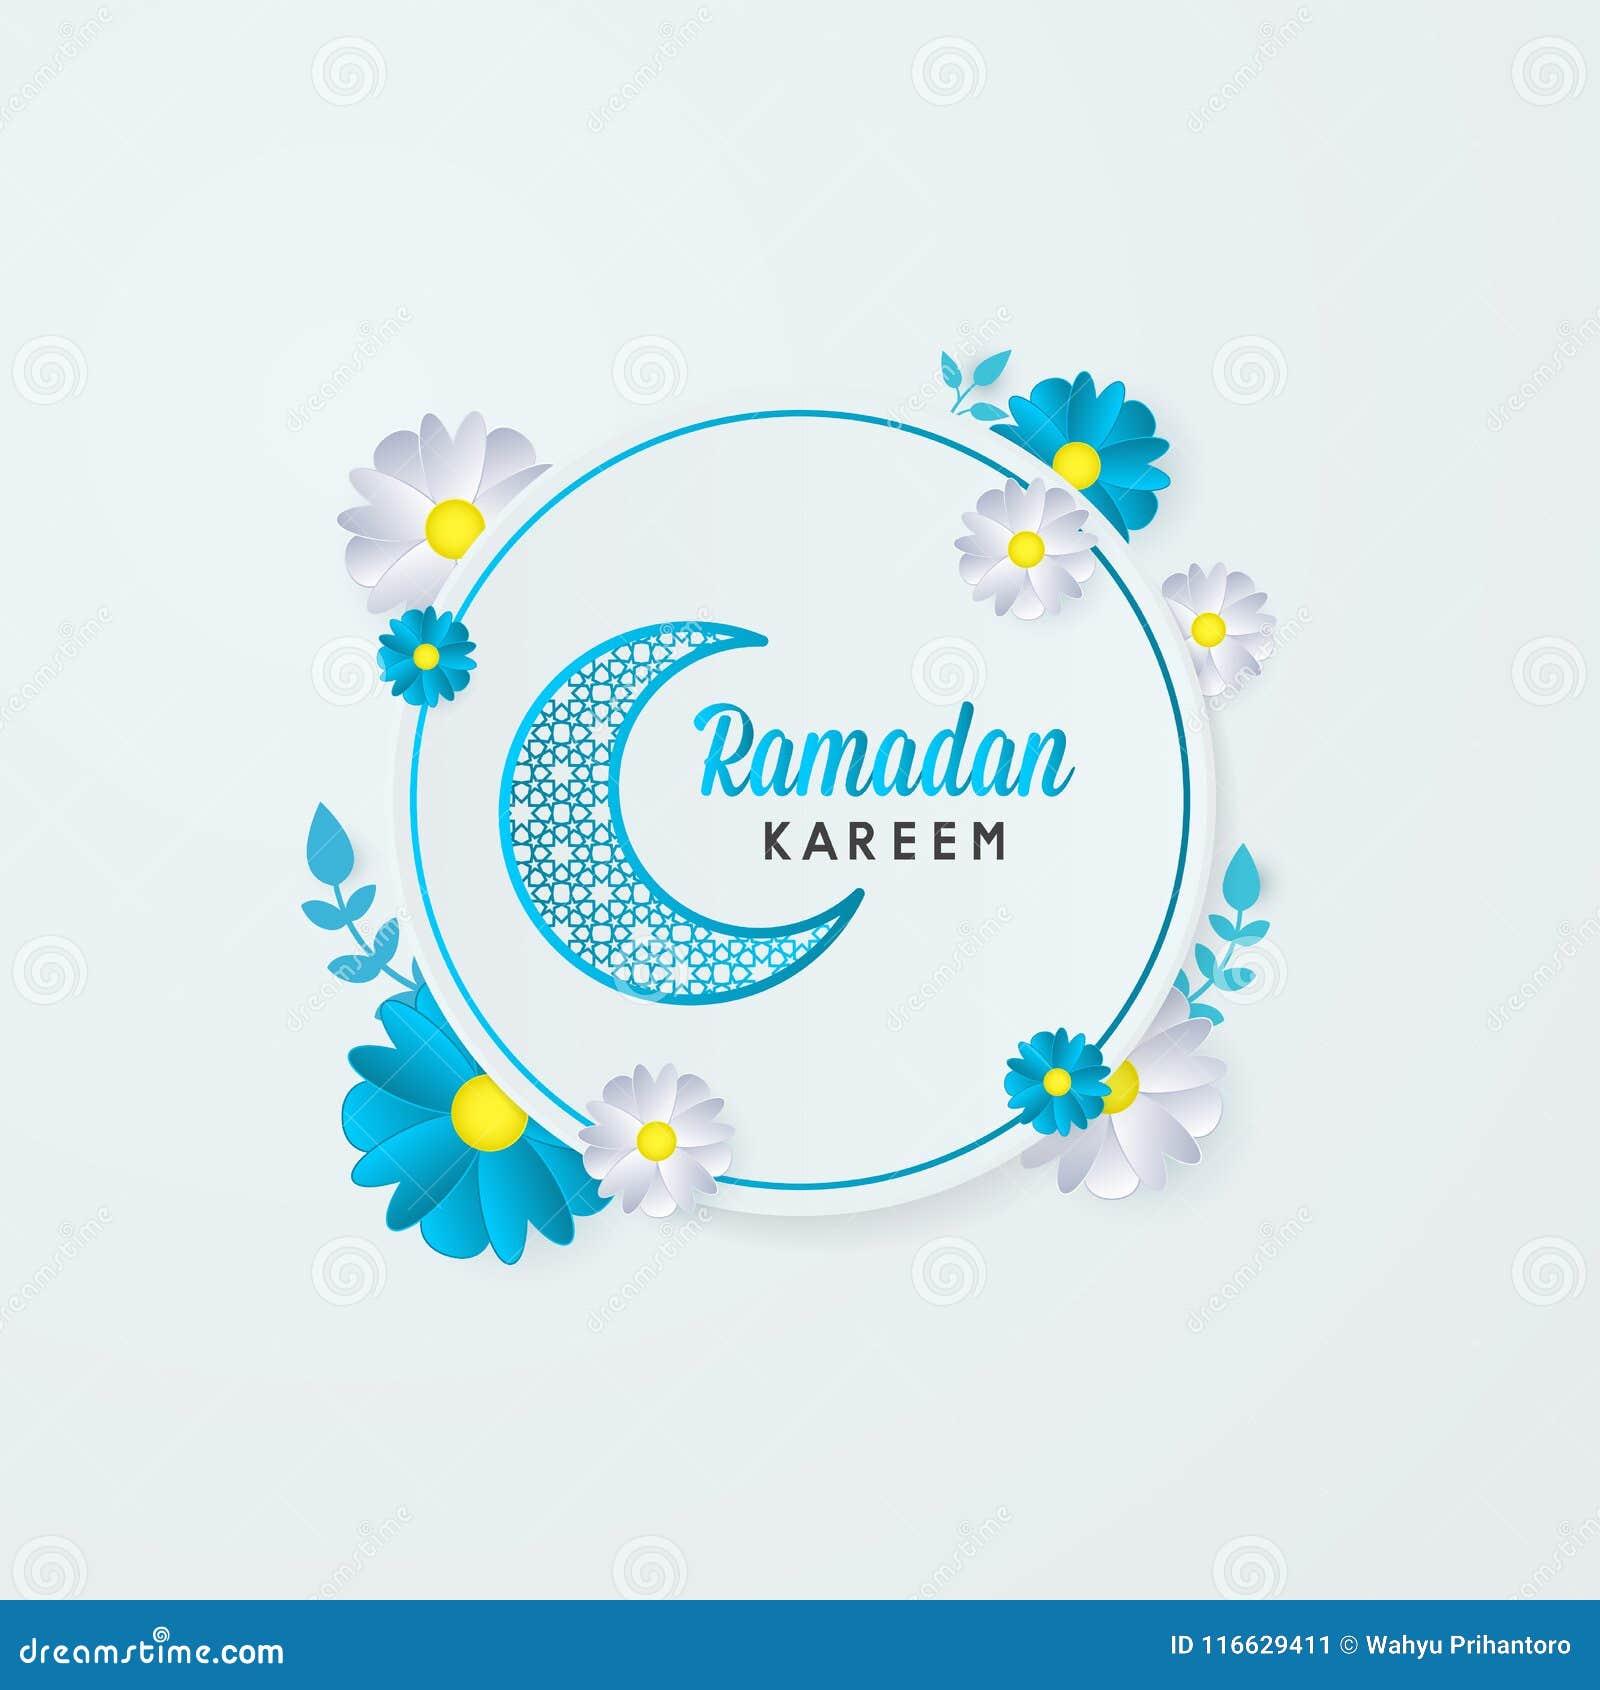 Ramadan kareem mosque moon night star glowing template greeting card ramadan kareem mosque moon night star glowing template greeting card maxwellsz